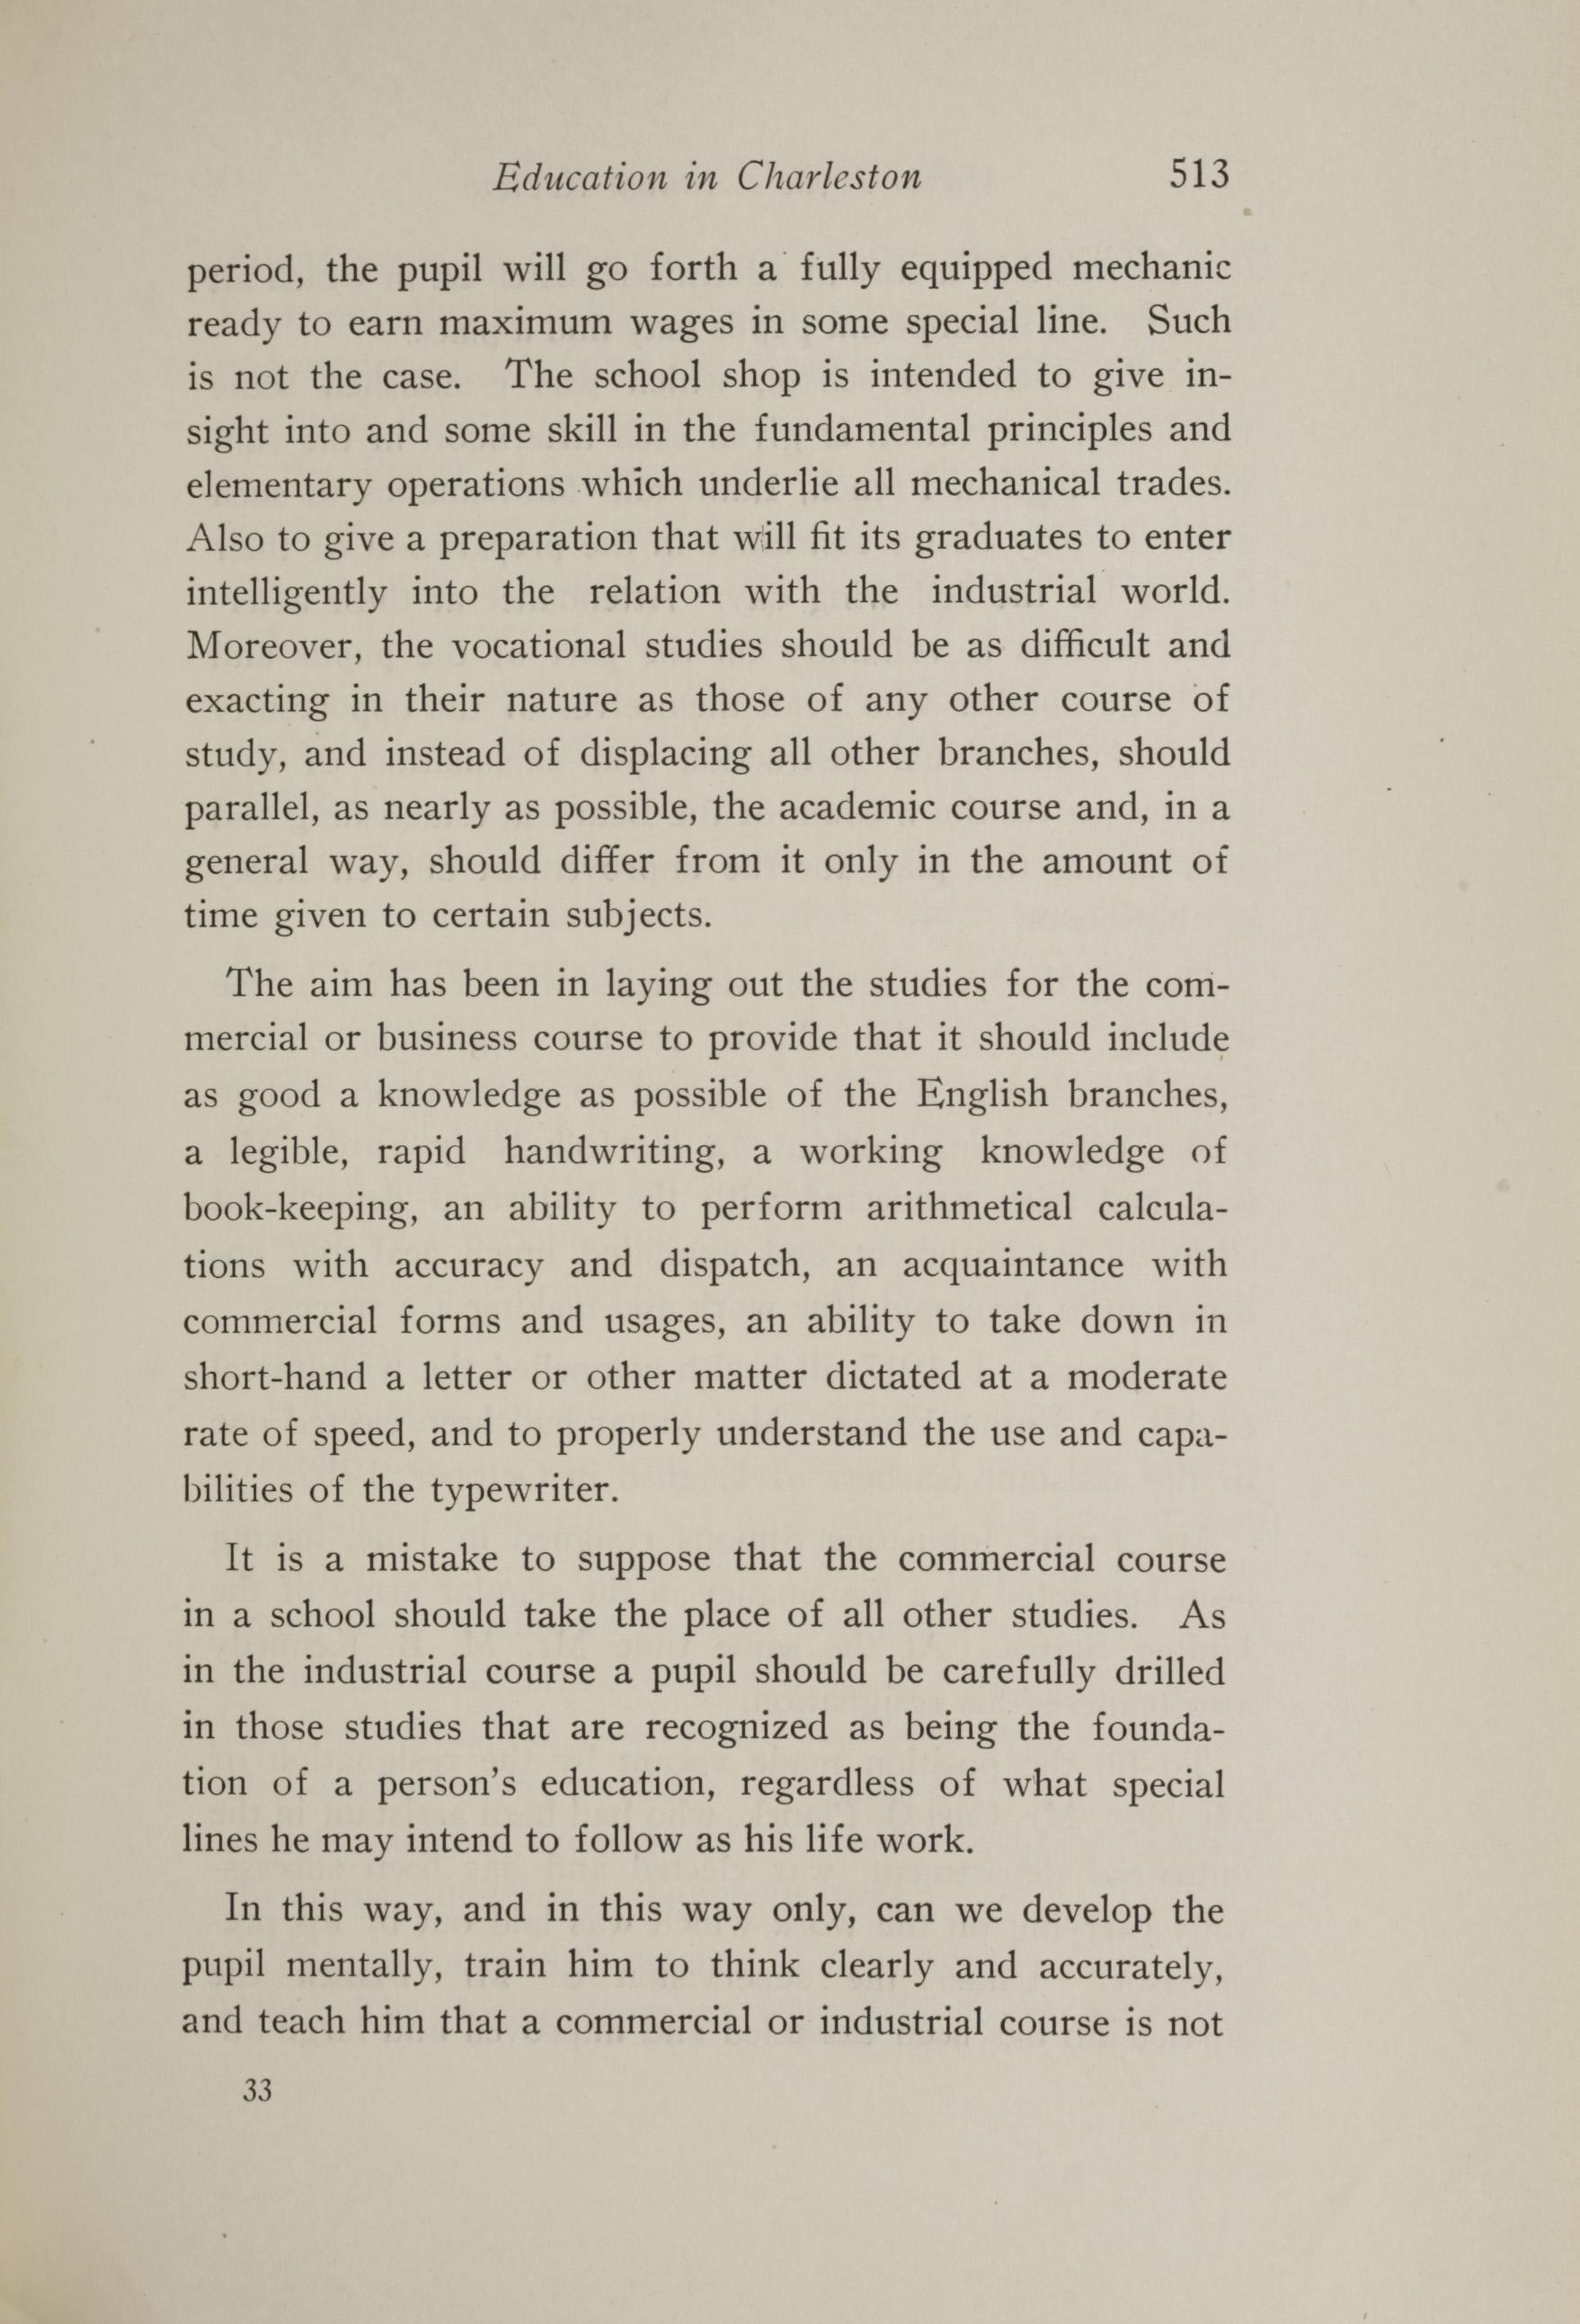 Charleston Yearbook, 1917, page 513